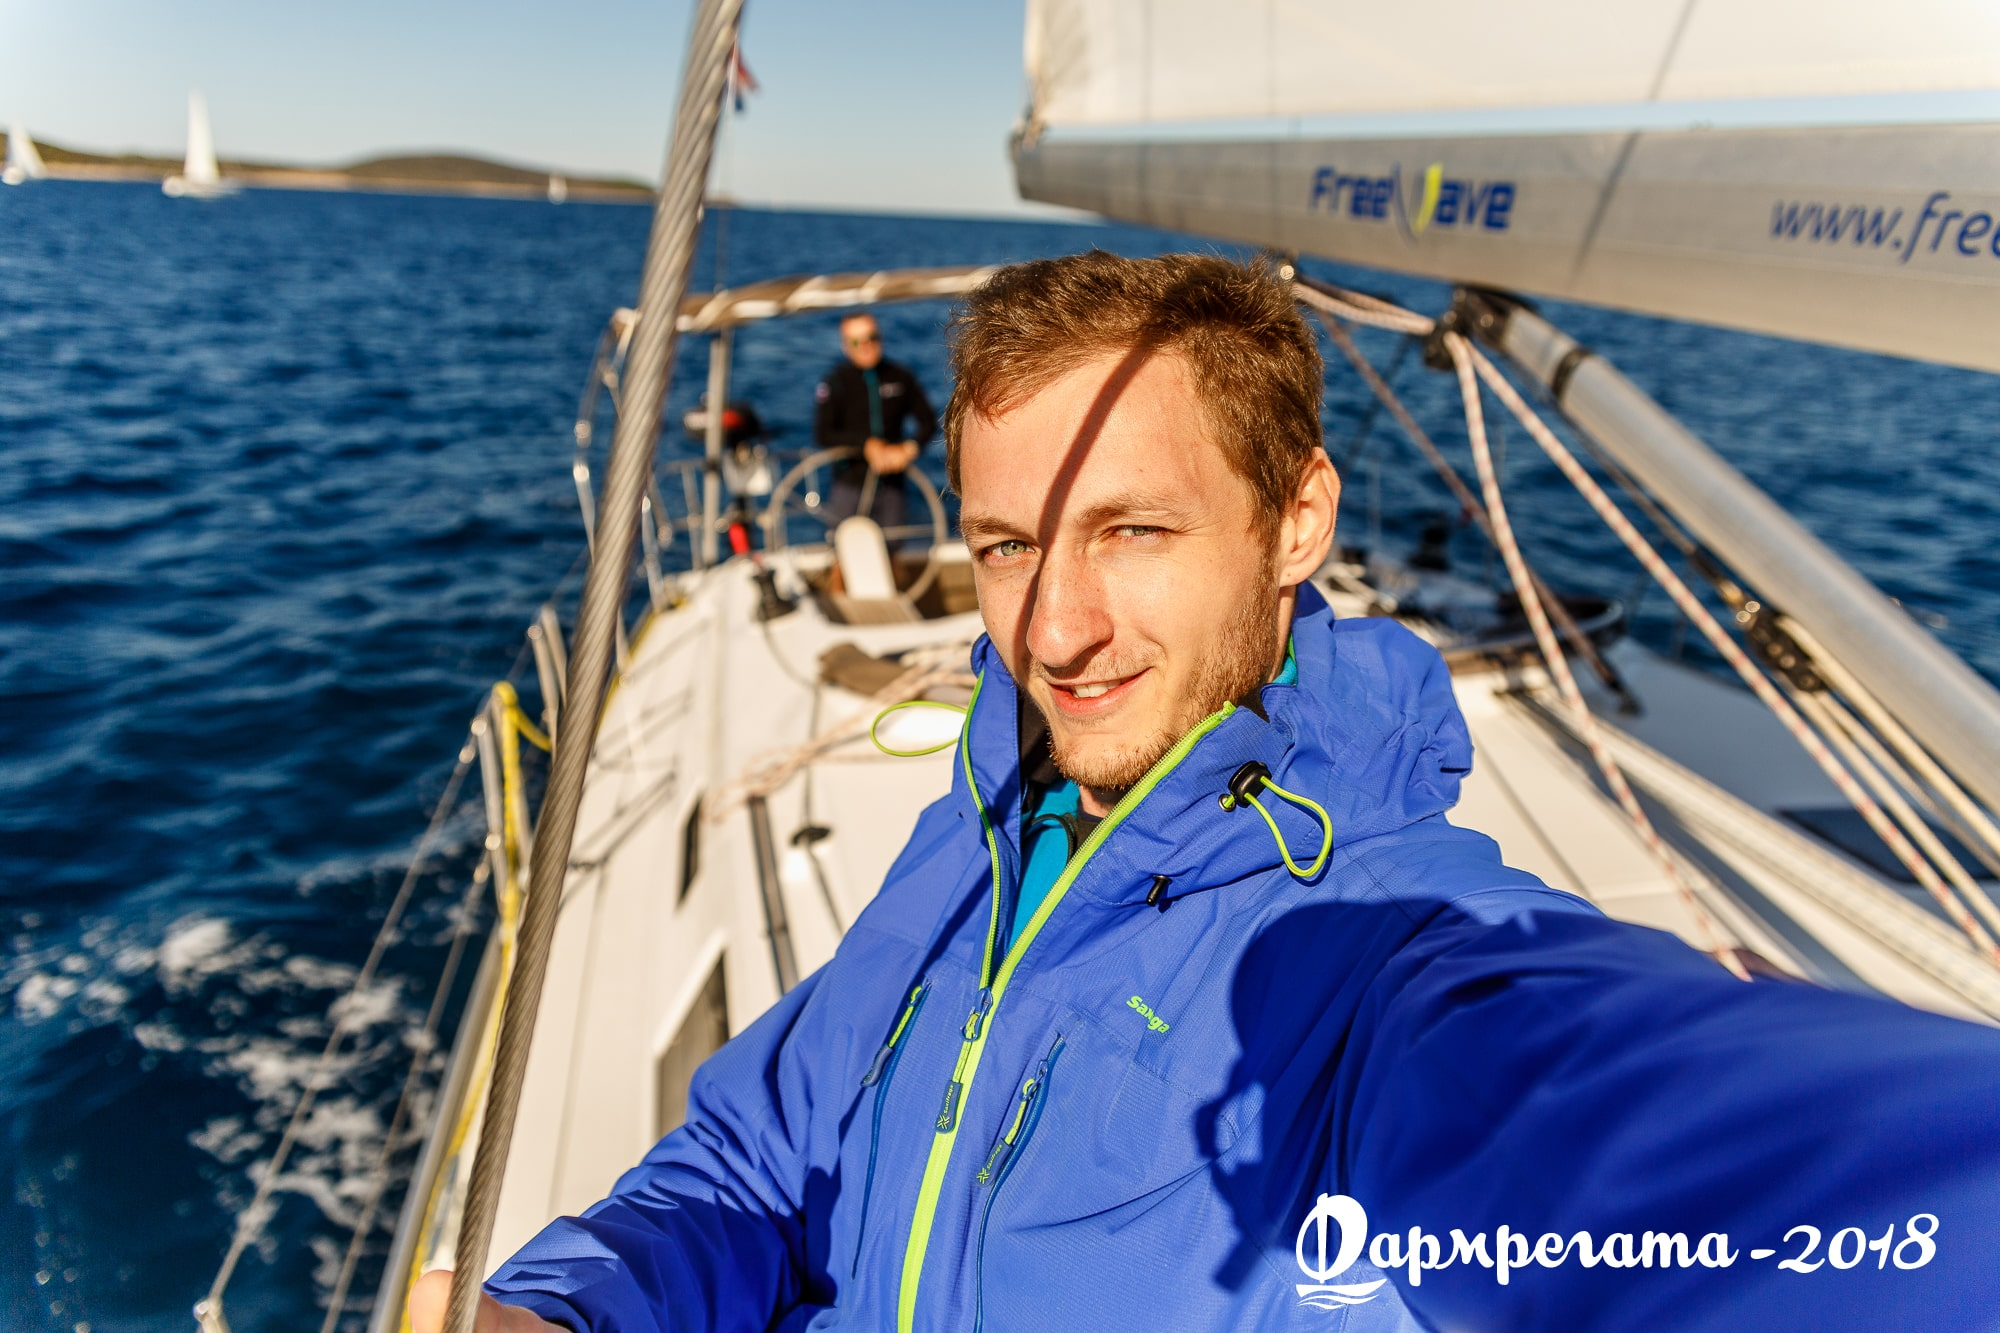 Яхтинг, путешествие, приключение - ДСМ групп Фармрегата 2018 - DSM Group Pharmregata 2018